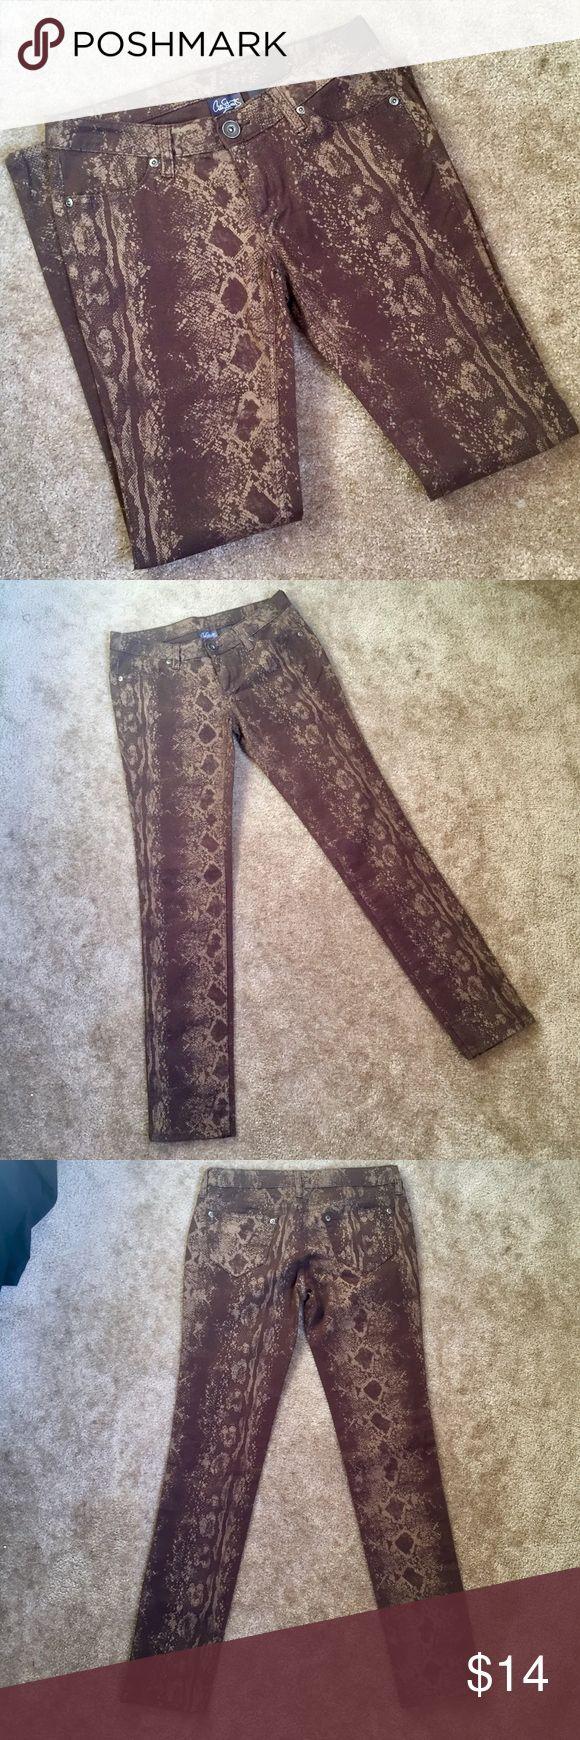 "Brown Snakeskin Print Skinny Jeans Like new skinny jeans in a fun snakeskin/reptile print.   Measurements:  • Inseam: 30""  • Waist 30""  Material: 99% cotton, 1% spandex City Streets Jeans Skinny"